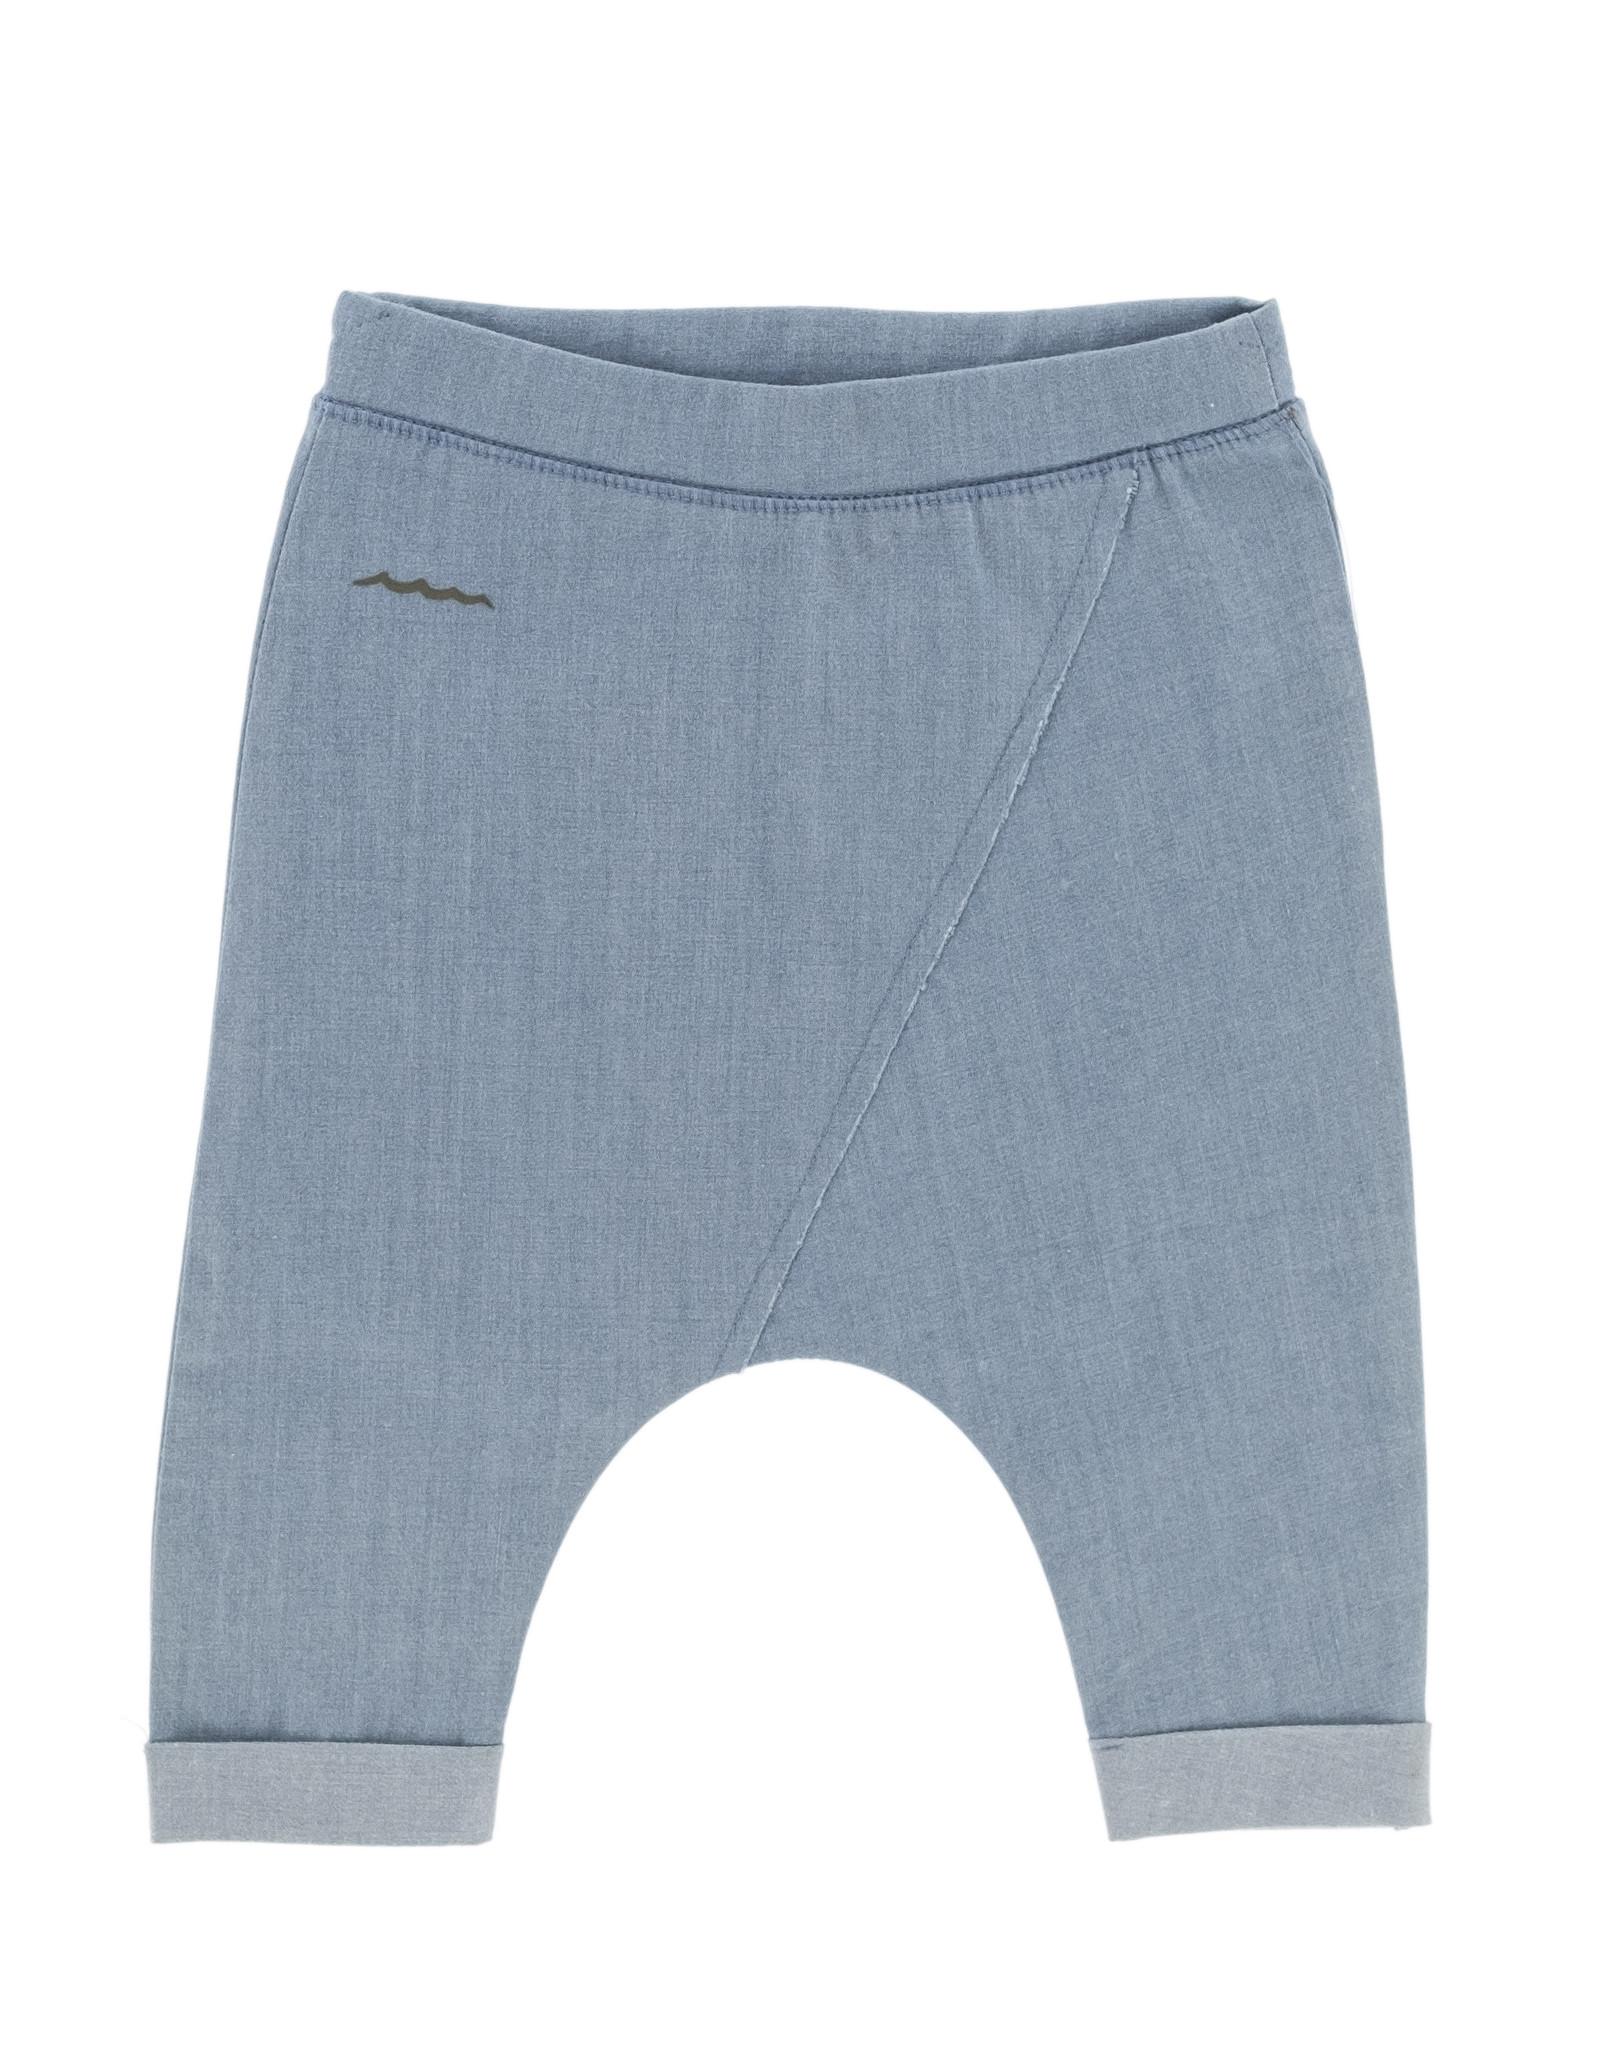 Riffle Amsterdam Riffle Amsterdam Baggy Pants Denim